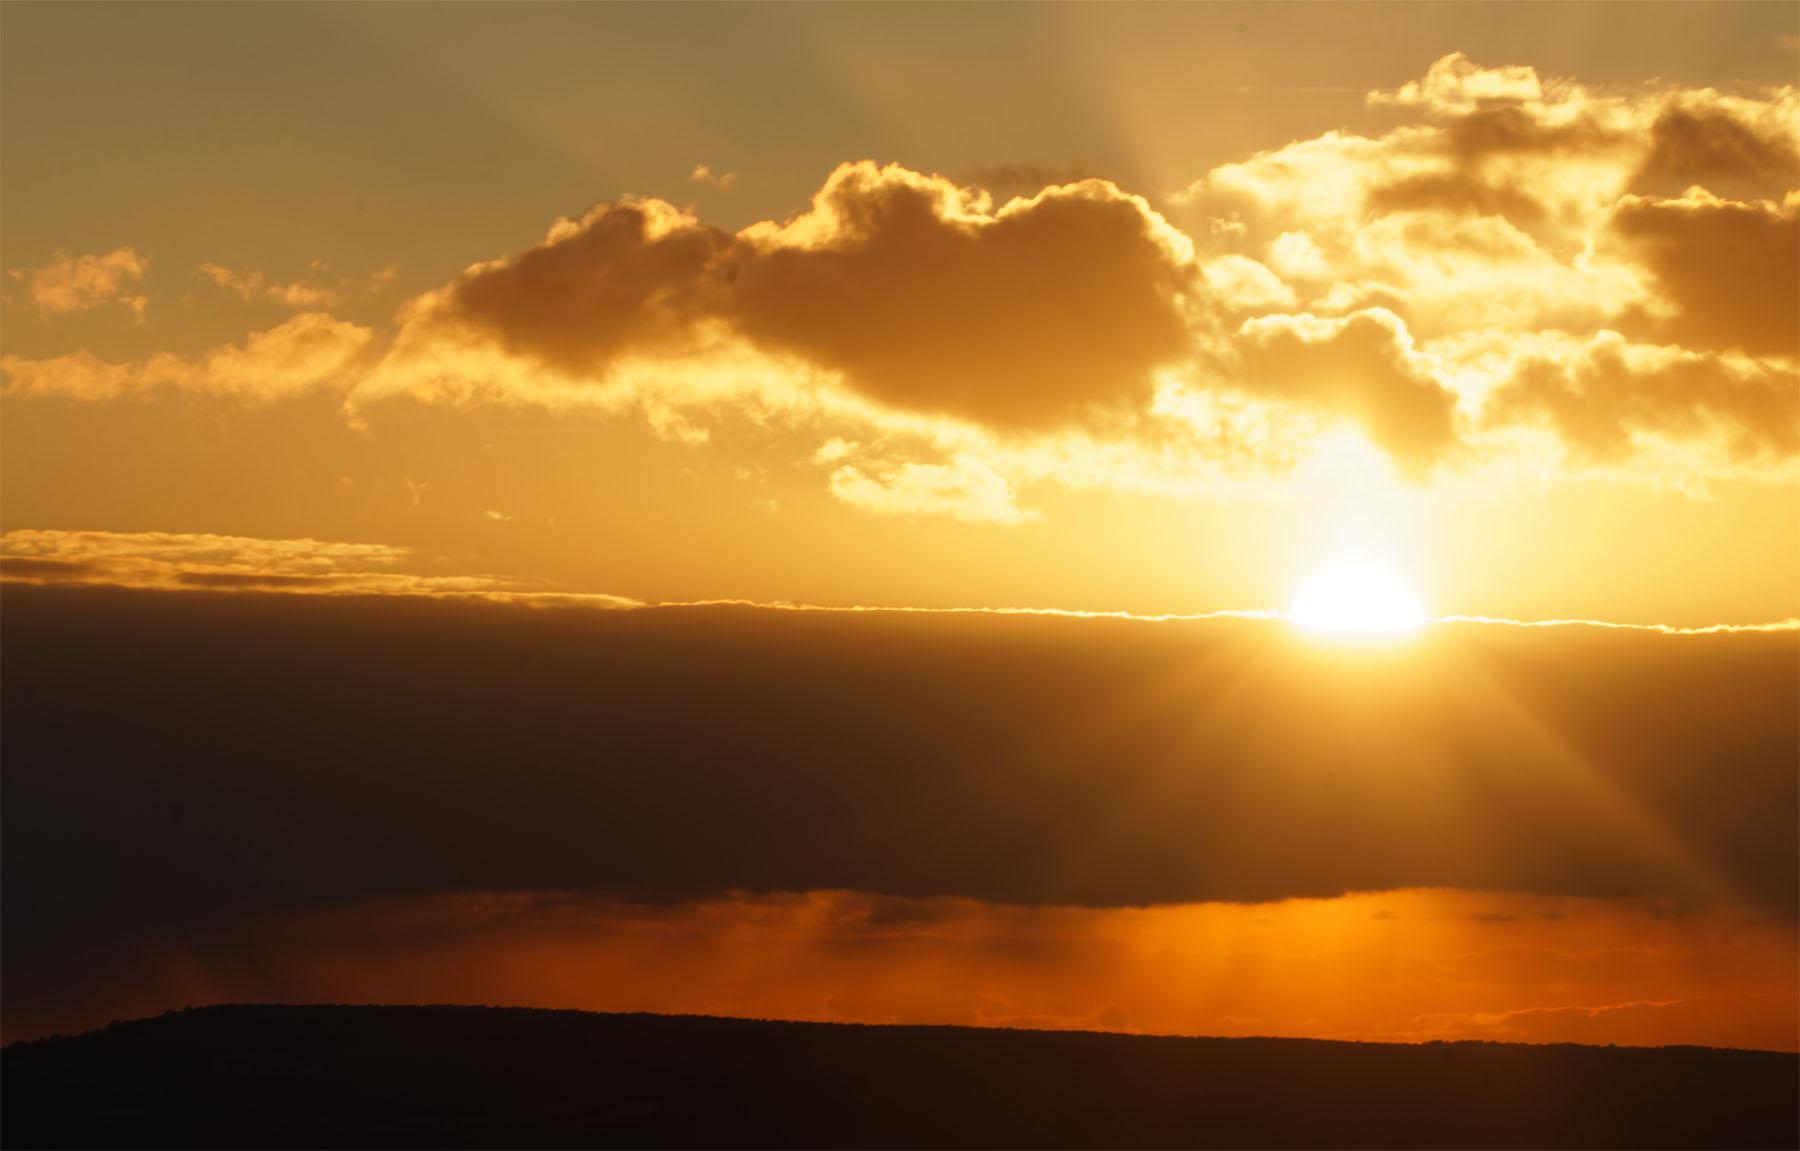 Sunset 10 Feb 21